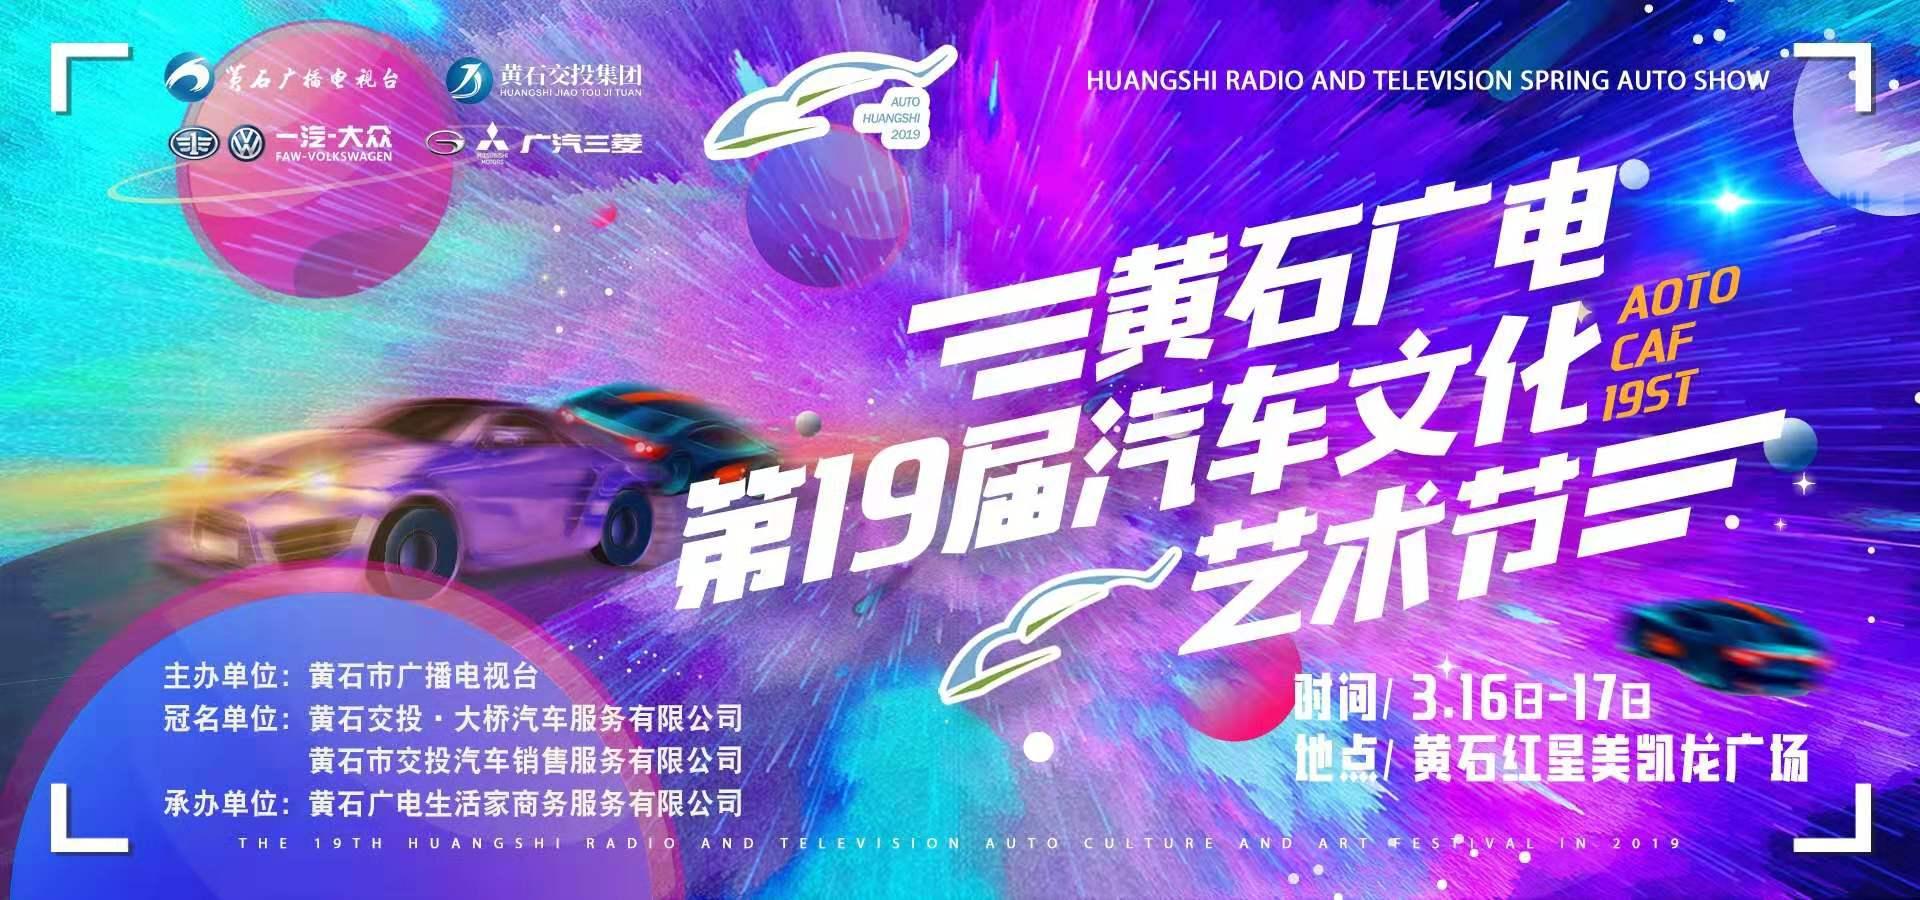 title='【云上直播】亚博app官方下载广电第19届汽车文化艺术节'